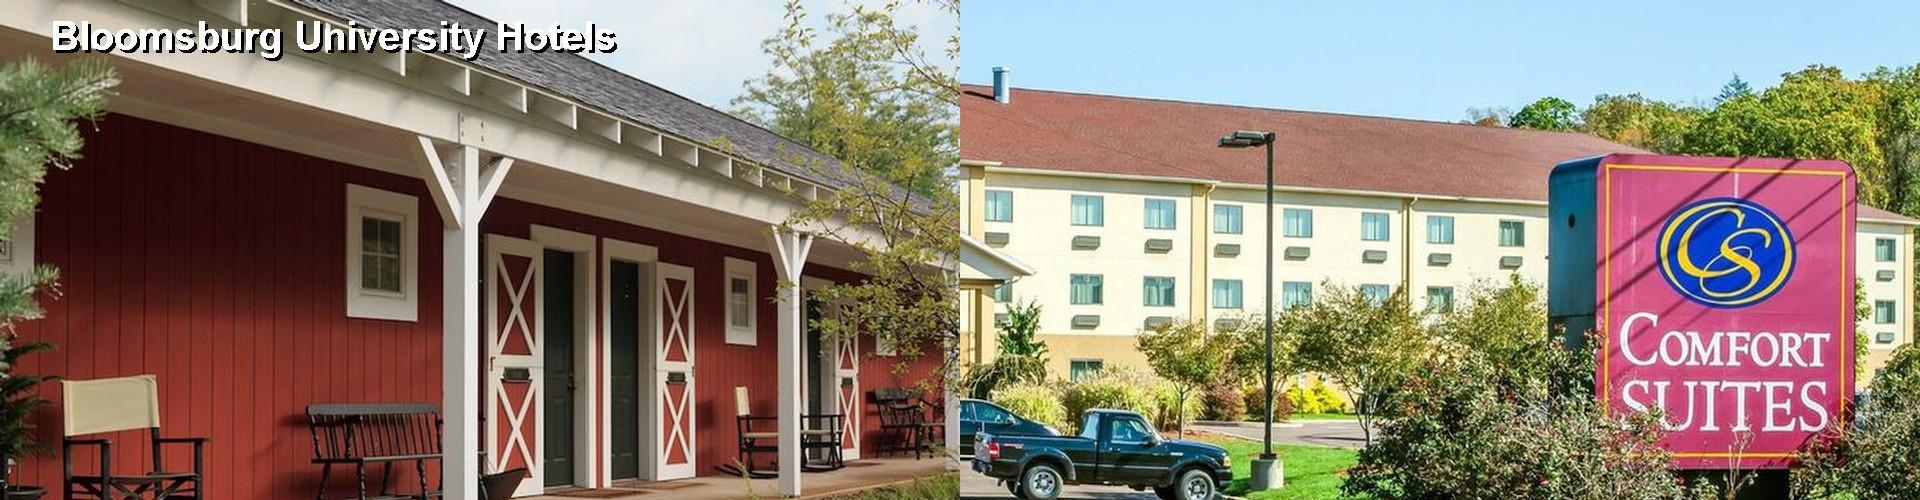 5 Best Hotels Near Bloomsburg University